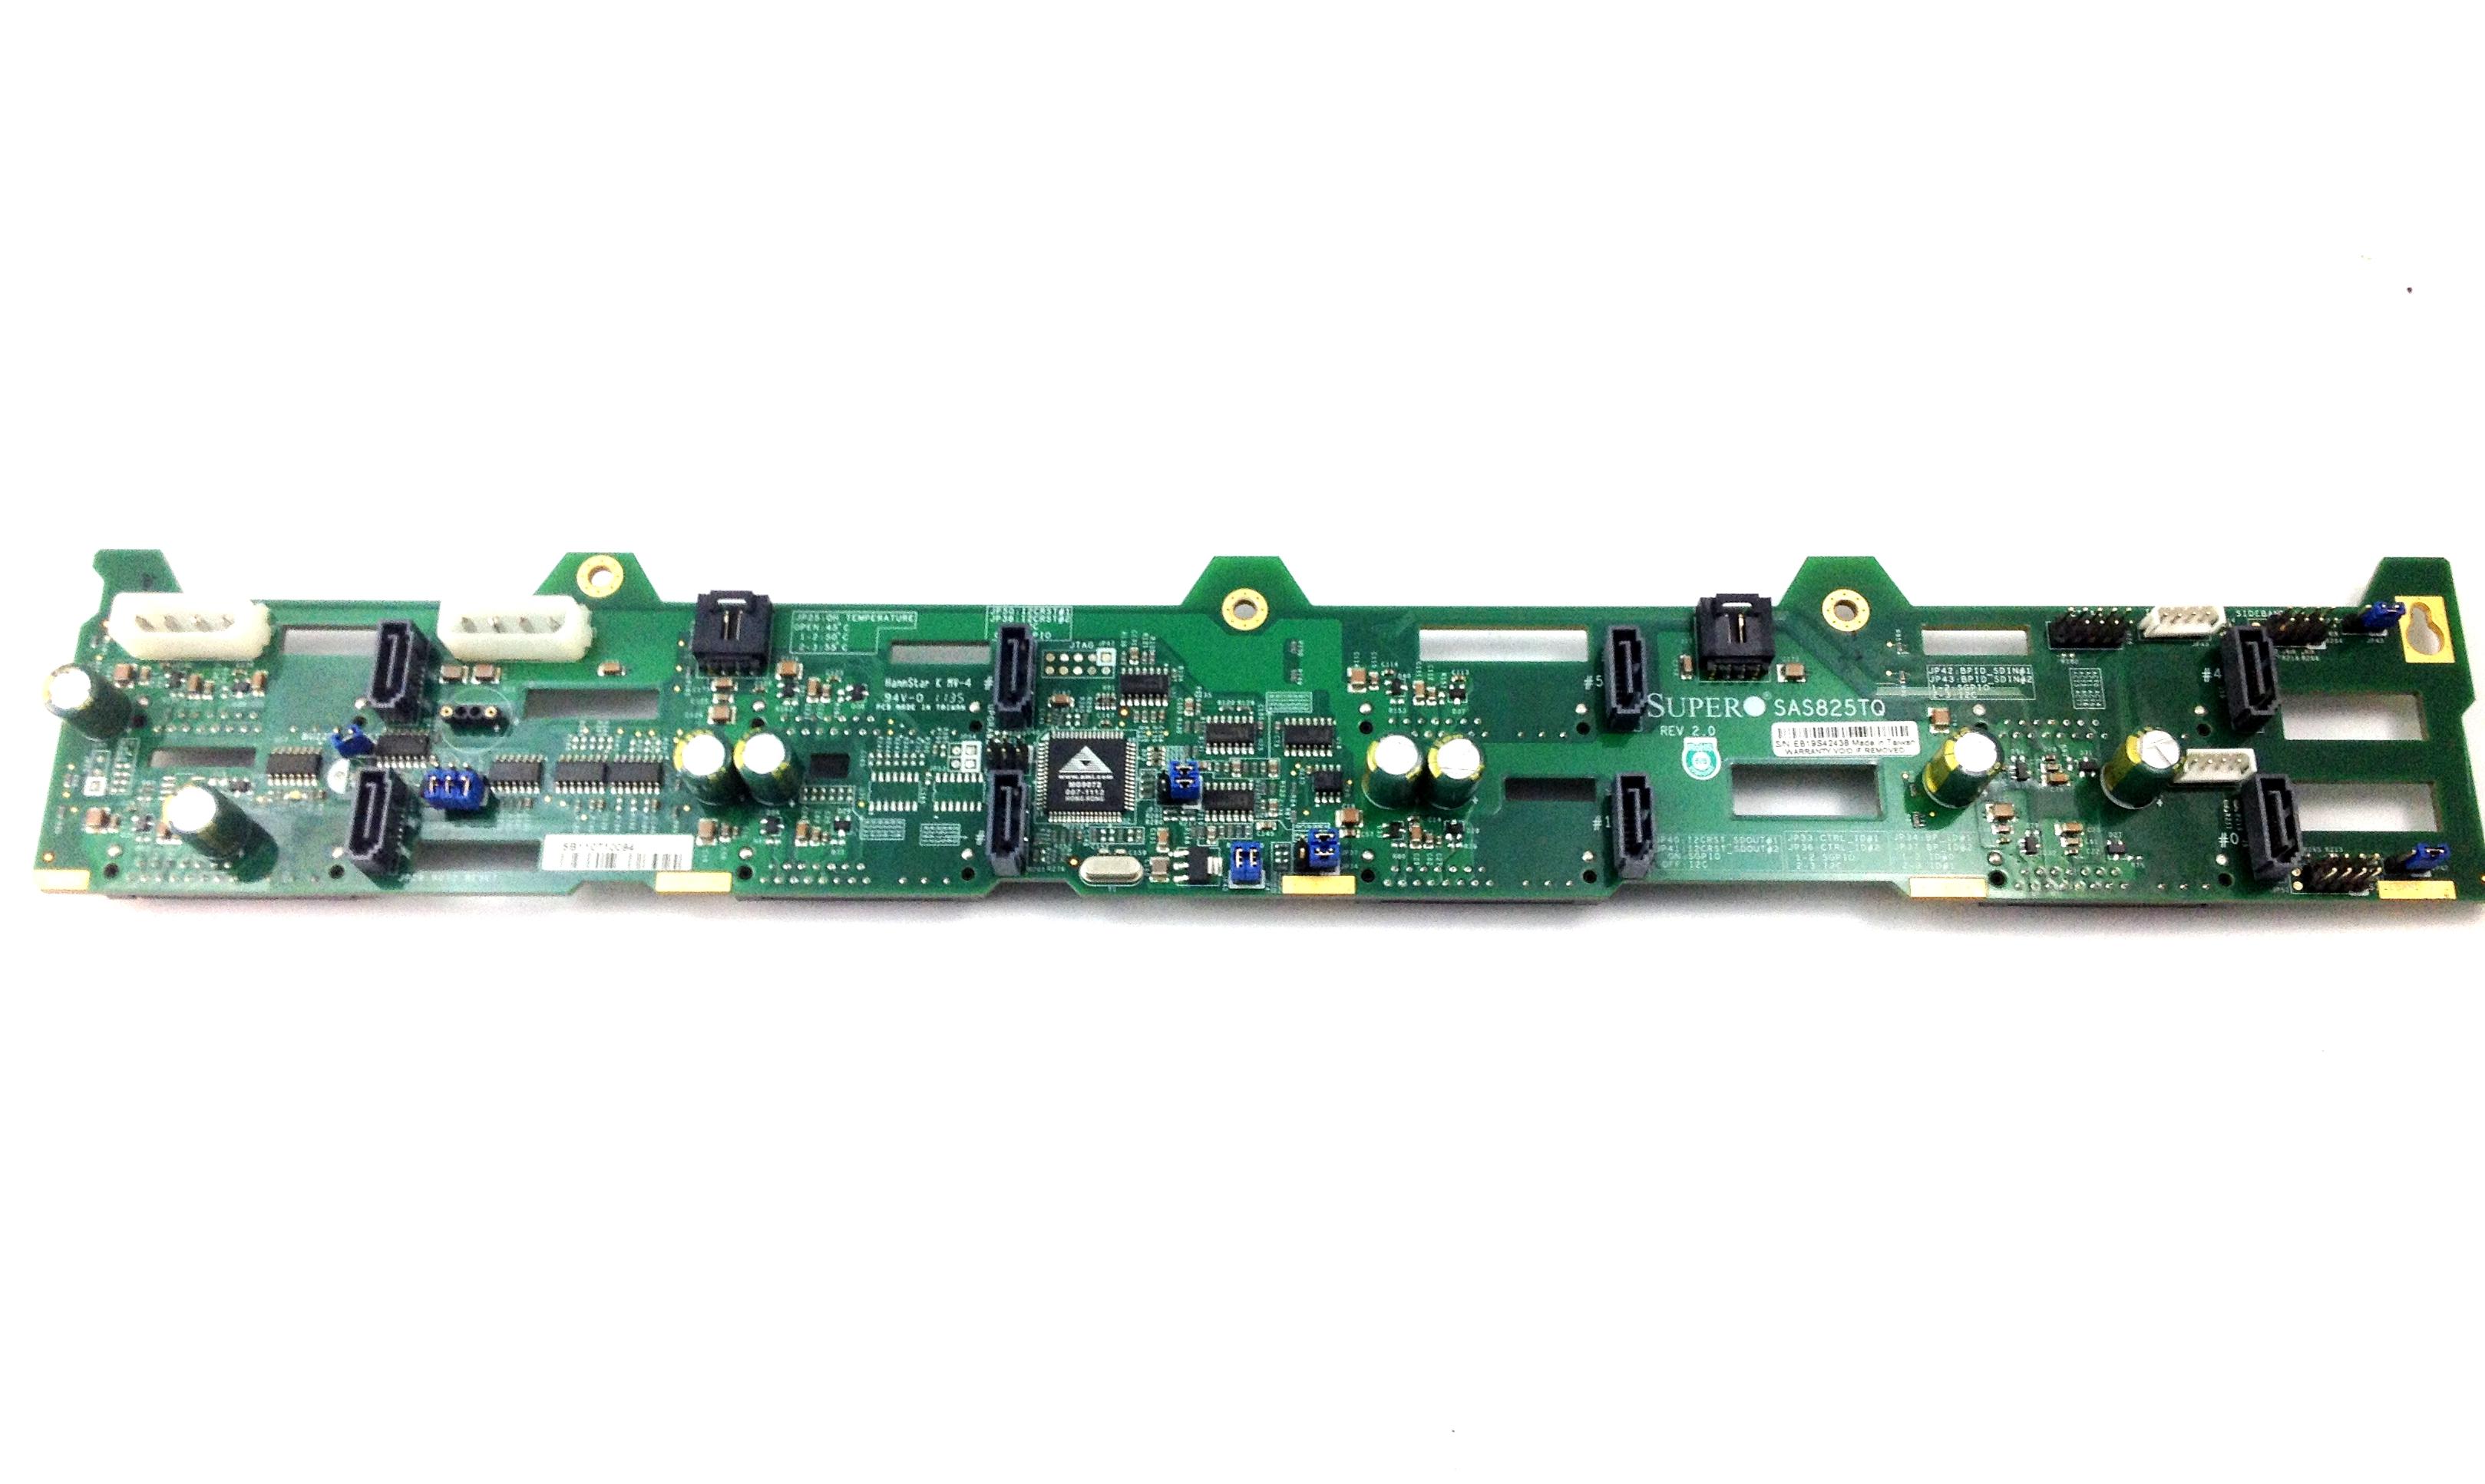 SUPERMICRO 2U 8-BAY SAS / SATA HARD DRIVE BACKPLANE (SAS825TQ)